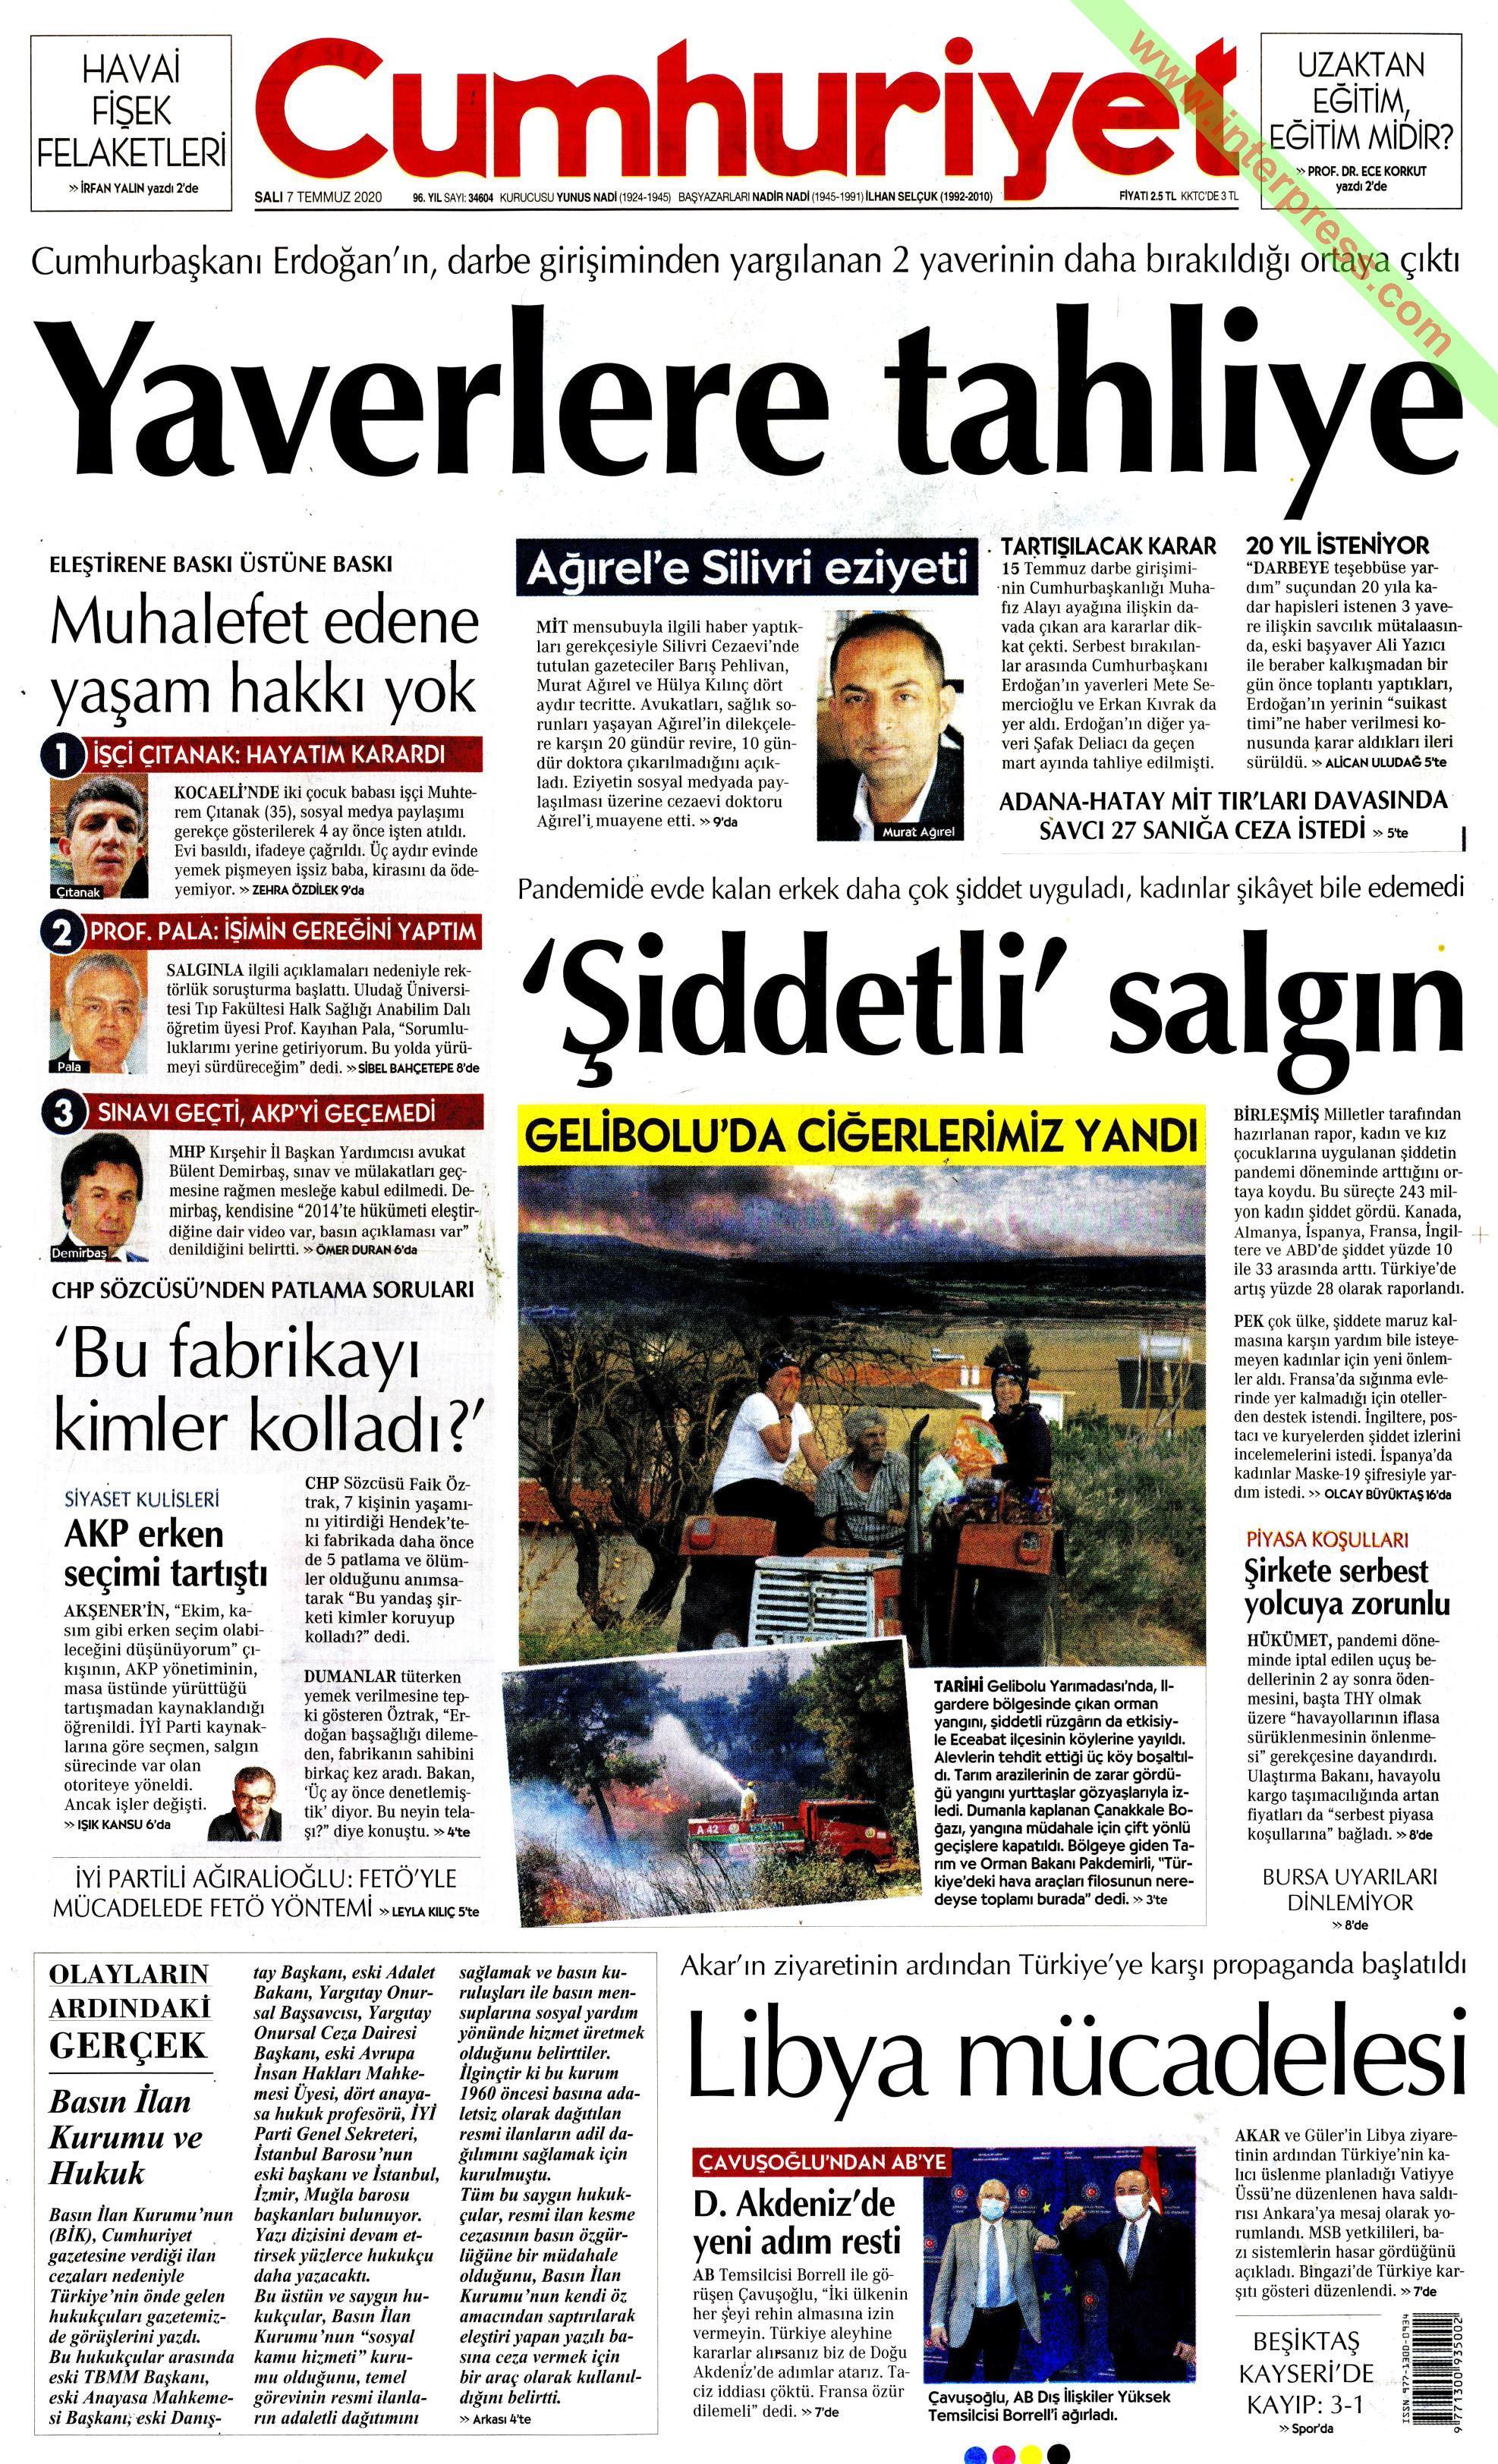 Cumhuriyet gazetesi manşet ilk sayfa oku